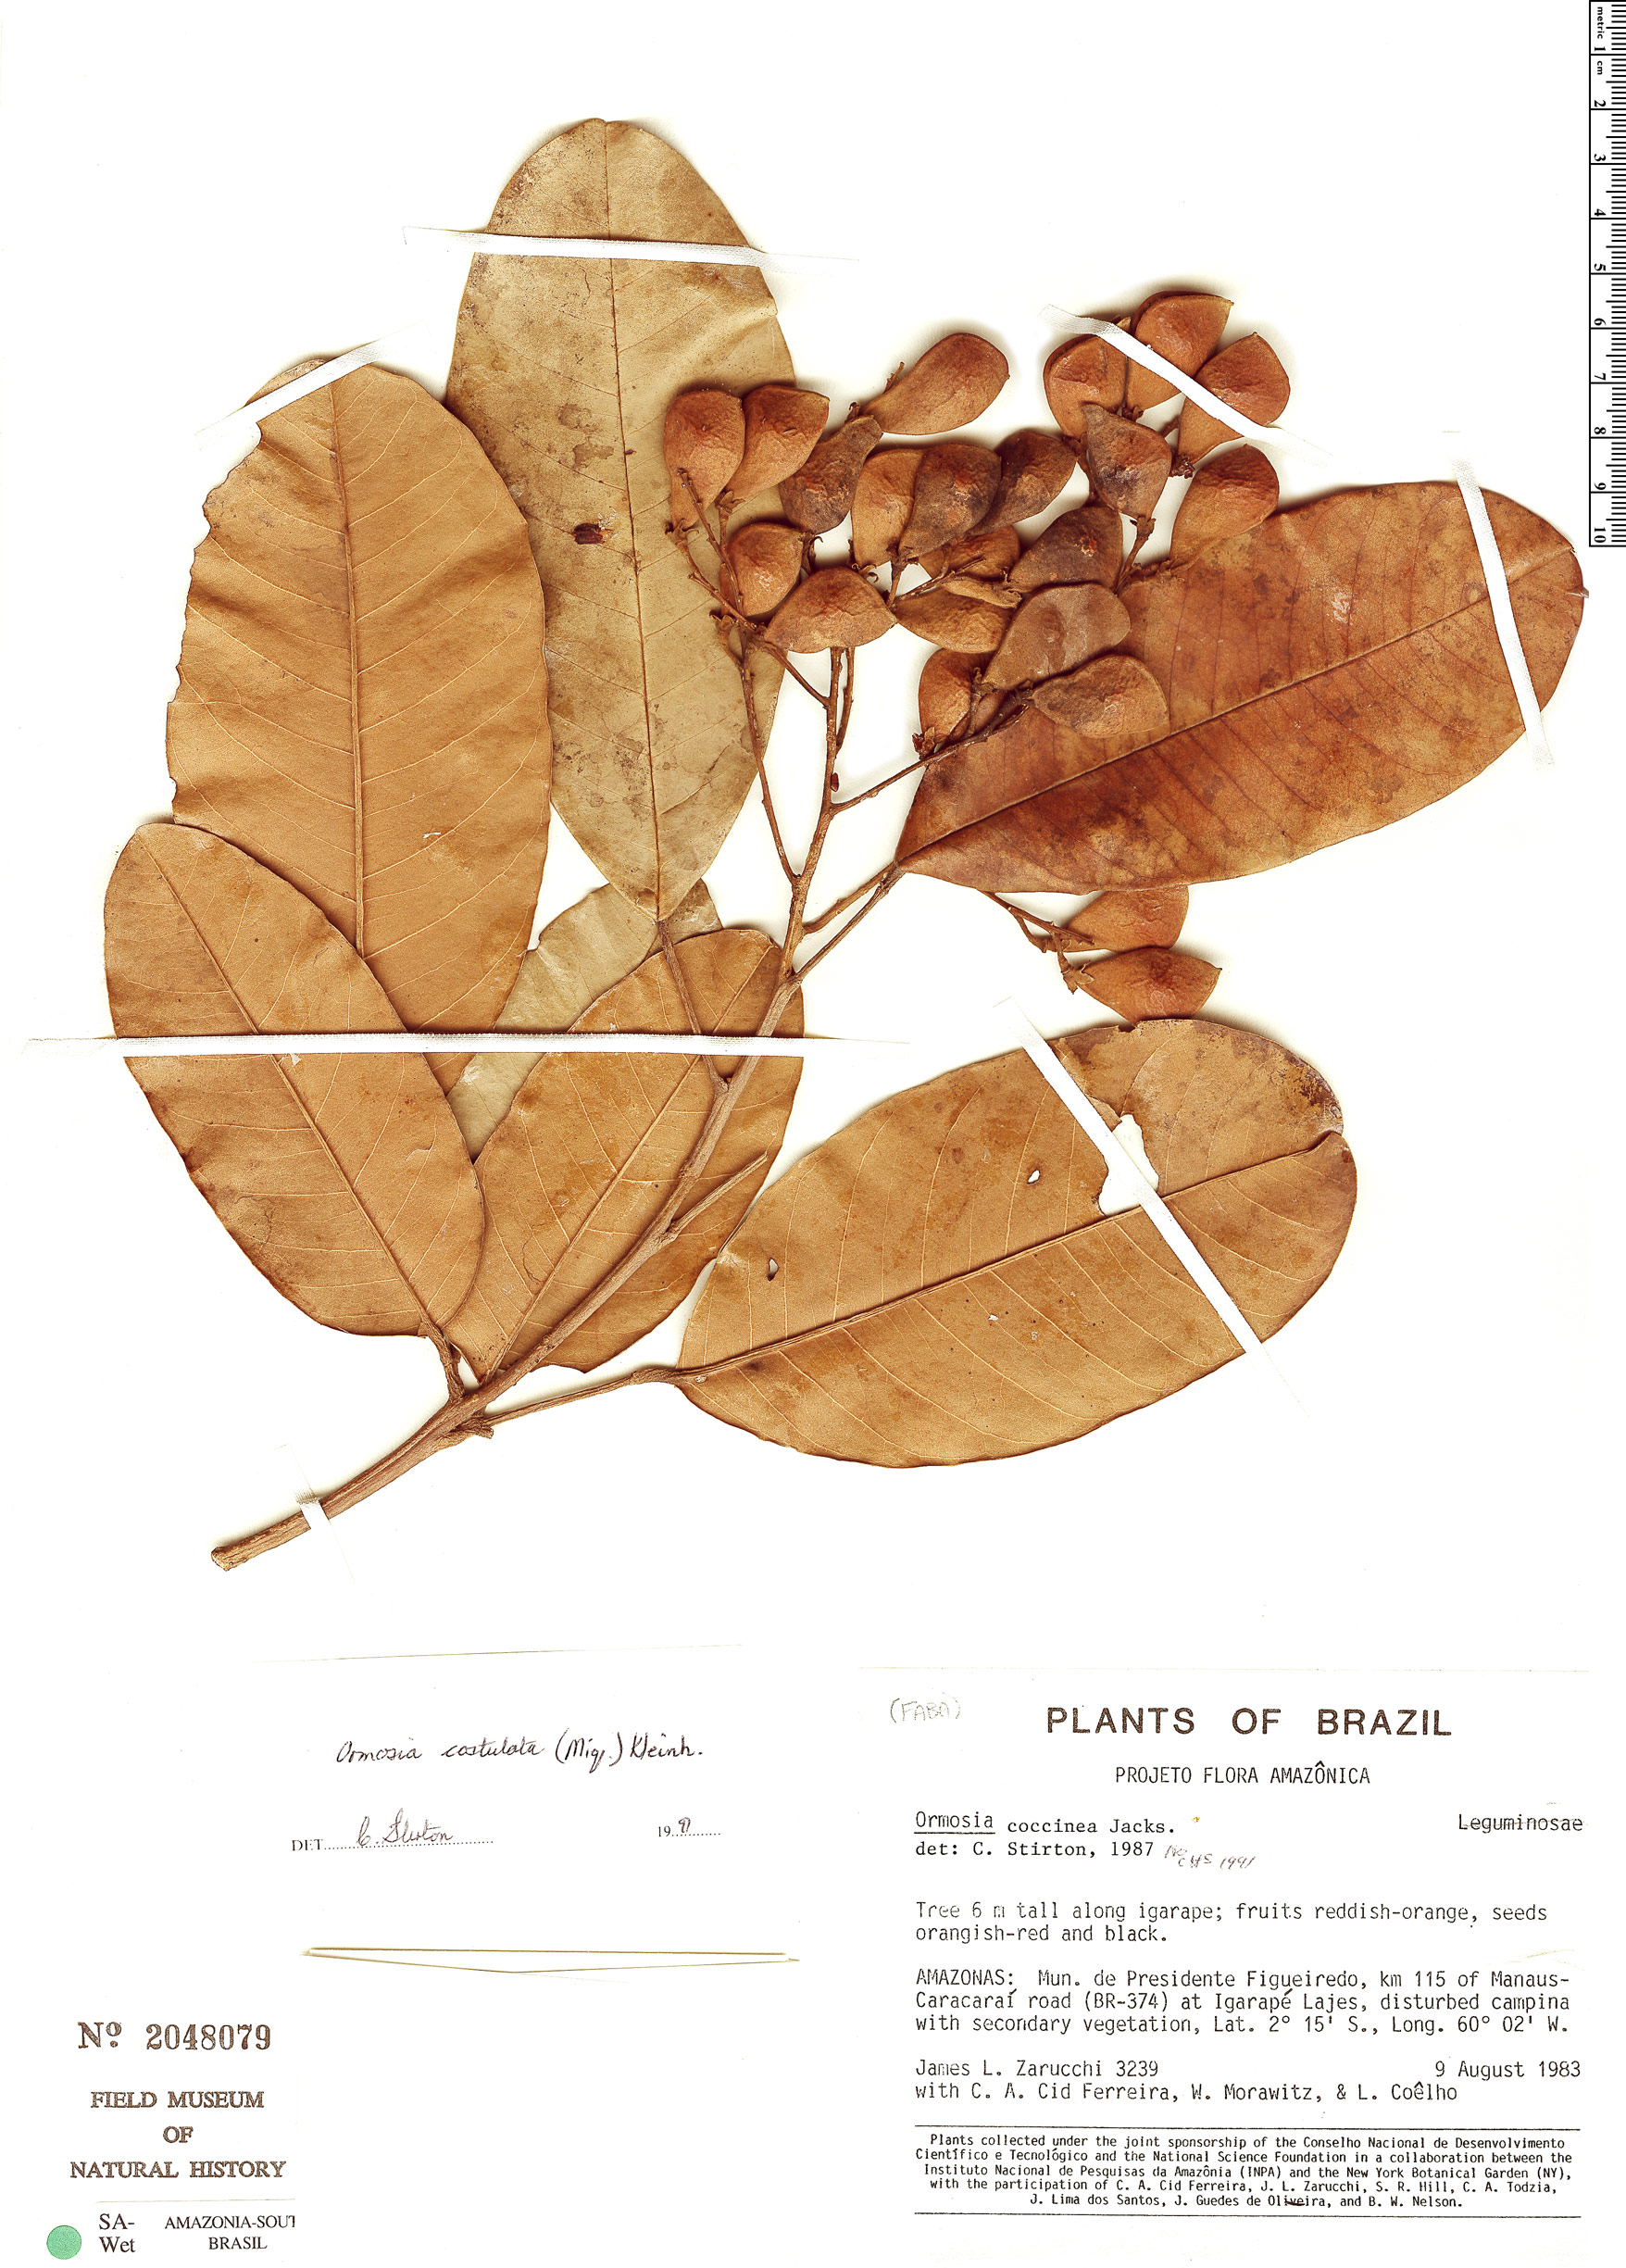 Espécime: Ormosia costulata